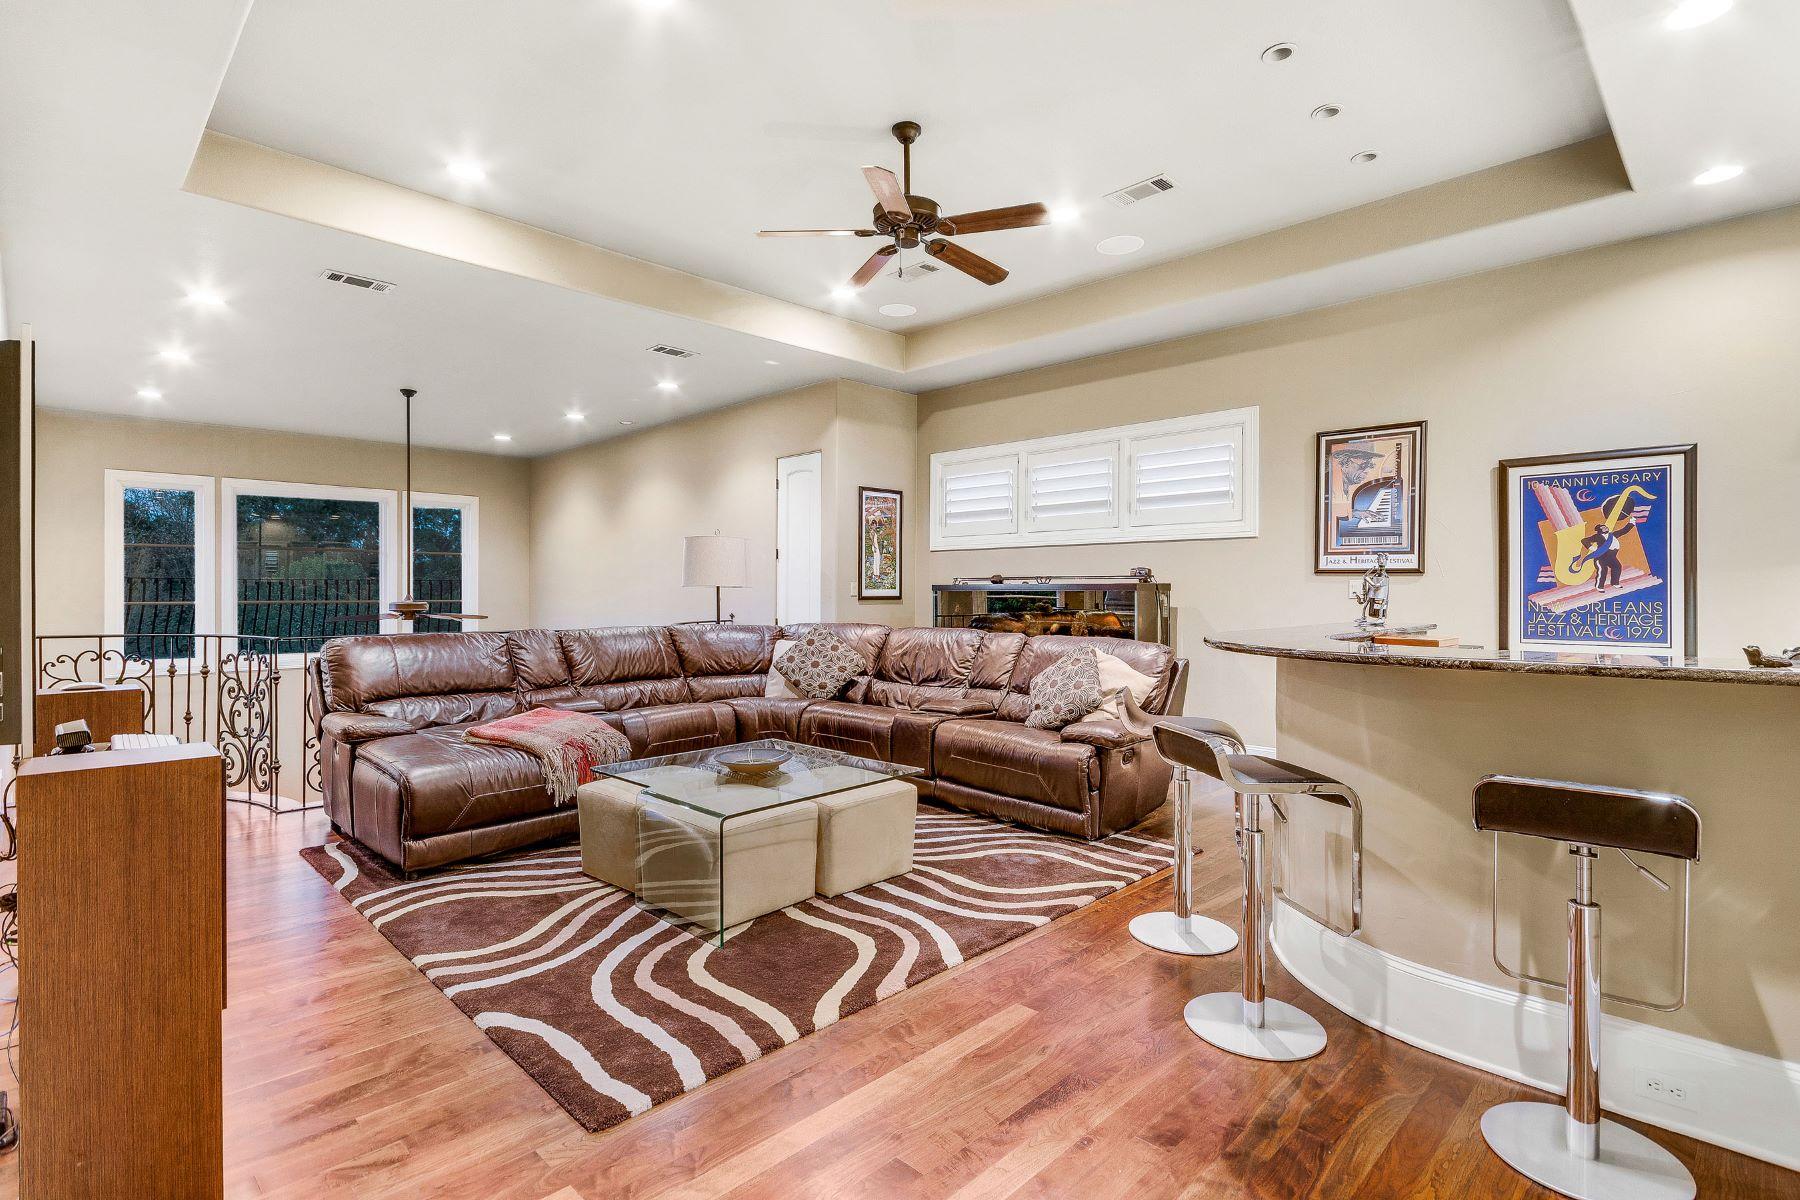 Additional photo for property listing at Sophisticated Barton Creek Estate 8416 Calera Dr Austin, Texas 78735 Estados Unidos